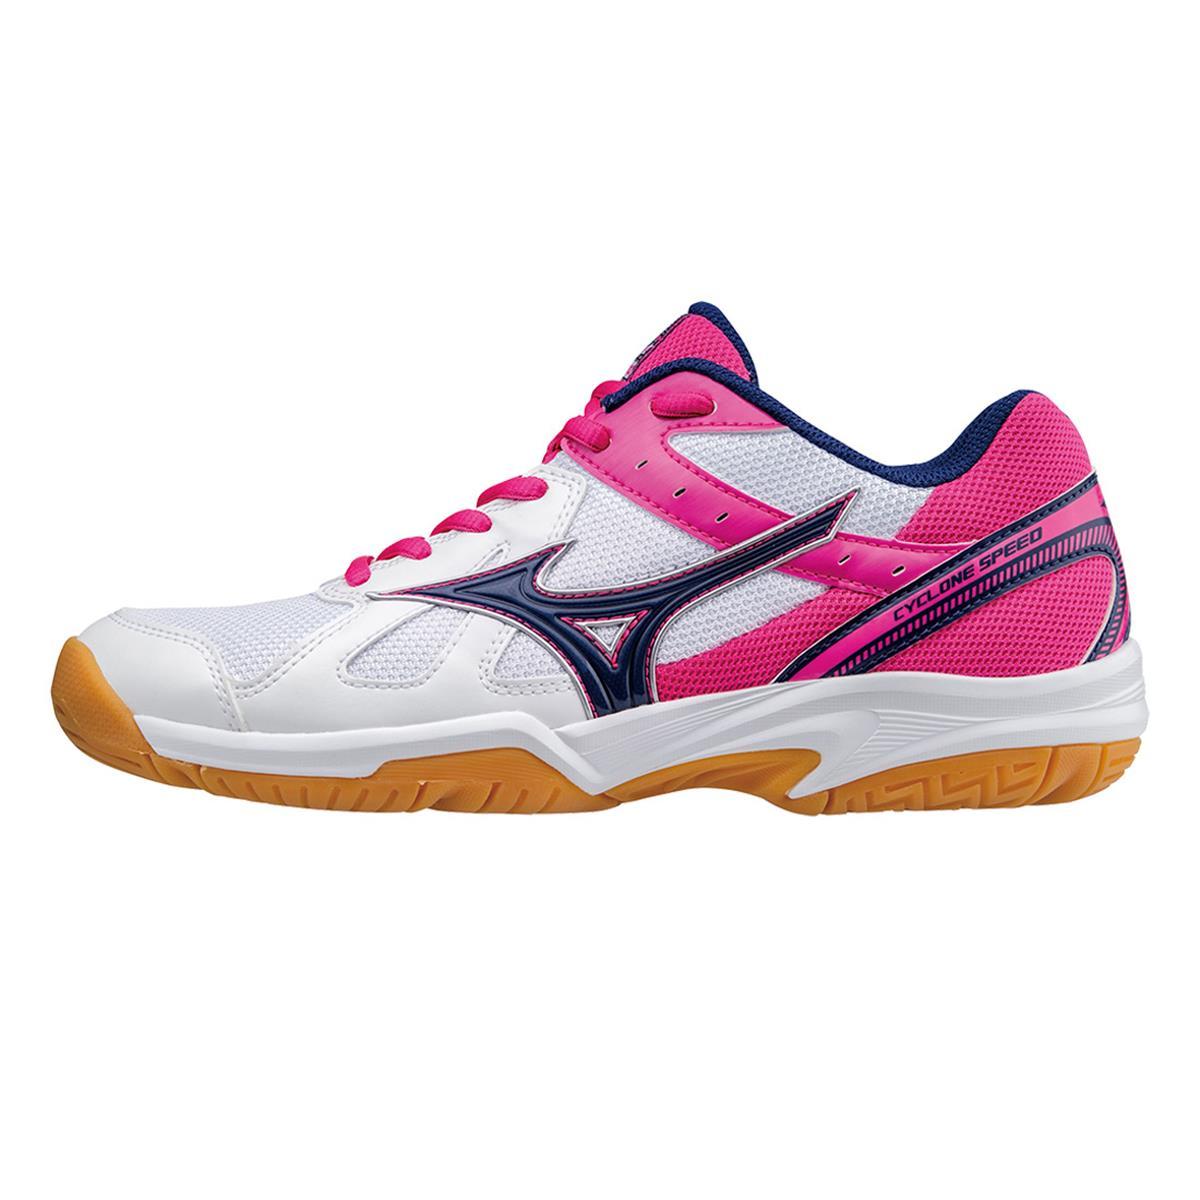 d64ceb0ed827 Mizuno Cyclone Speed Womens Court Shoes | directsportseshop.co.uk